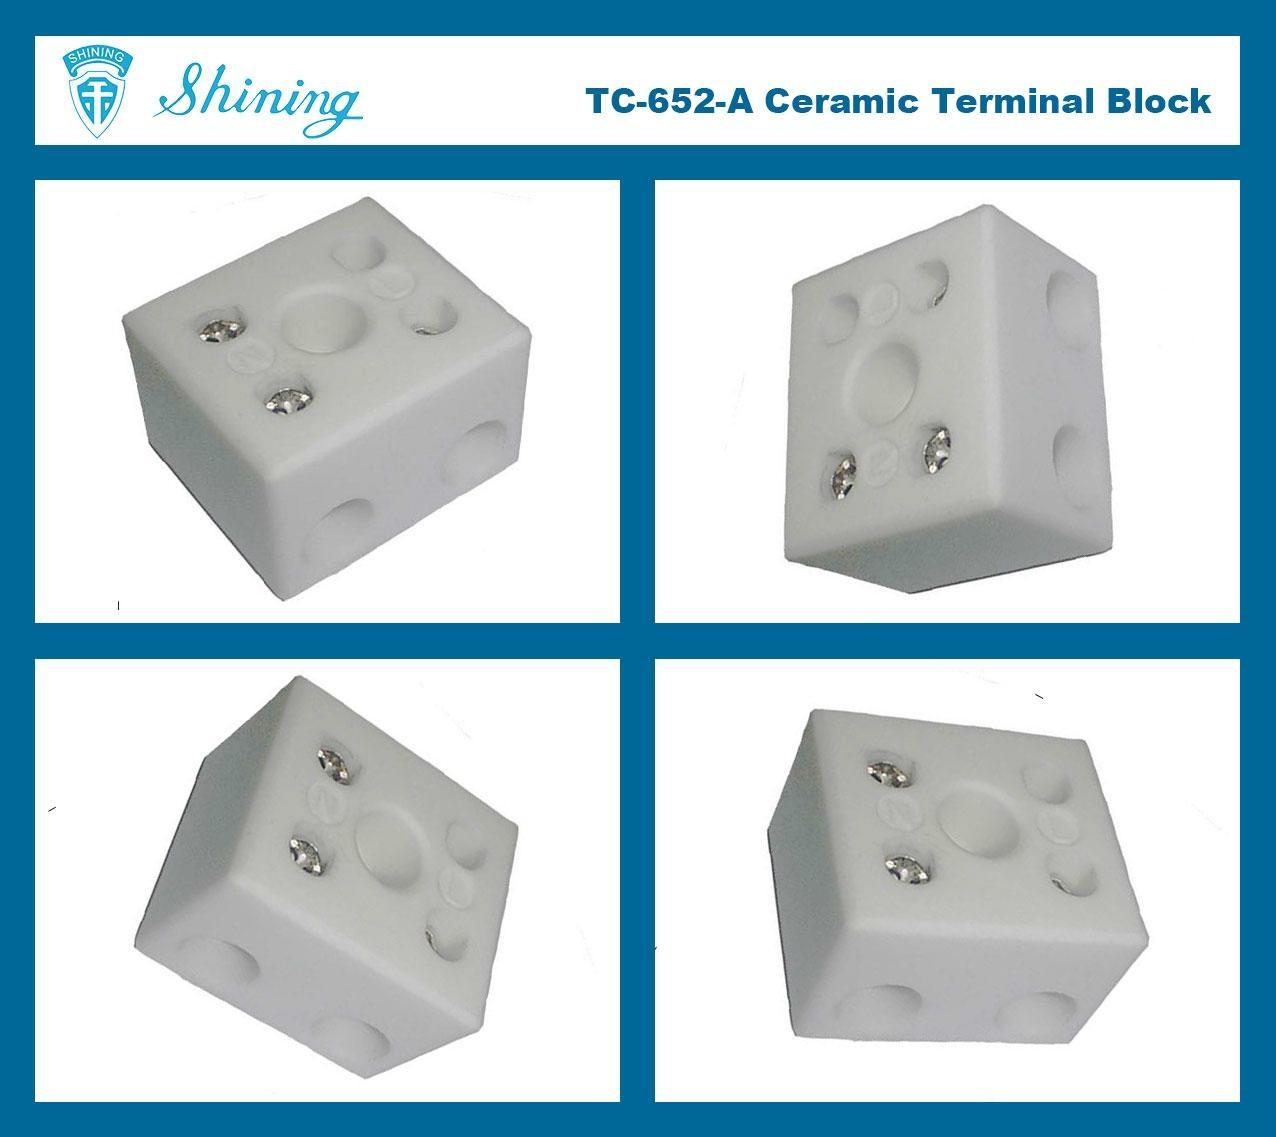 TC-652-A 陶瓷端子台 Ceramic Terminal Block 7